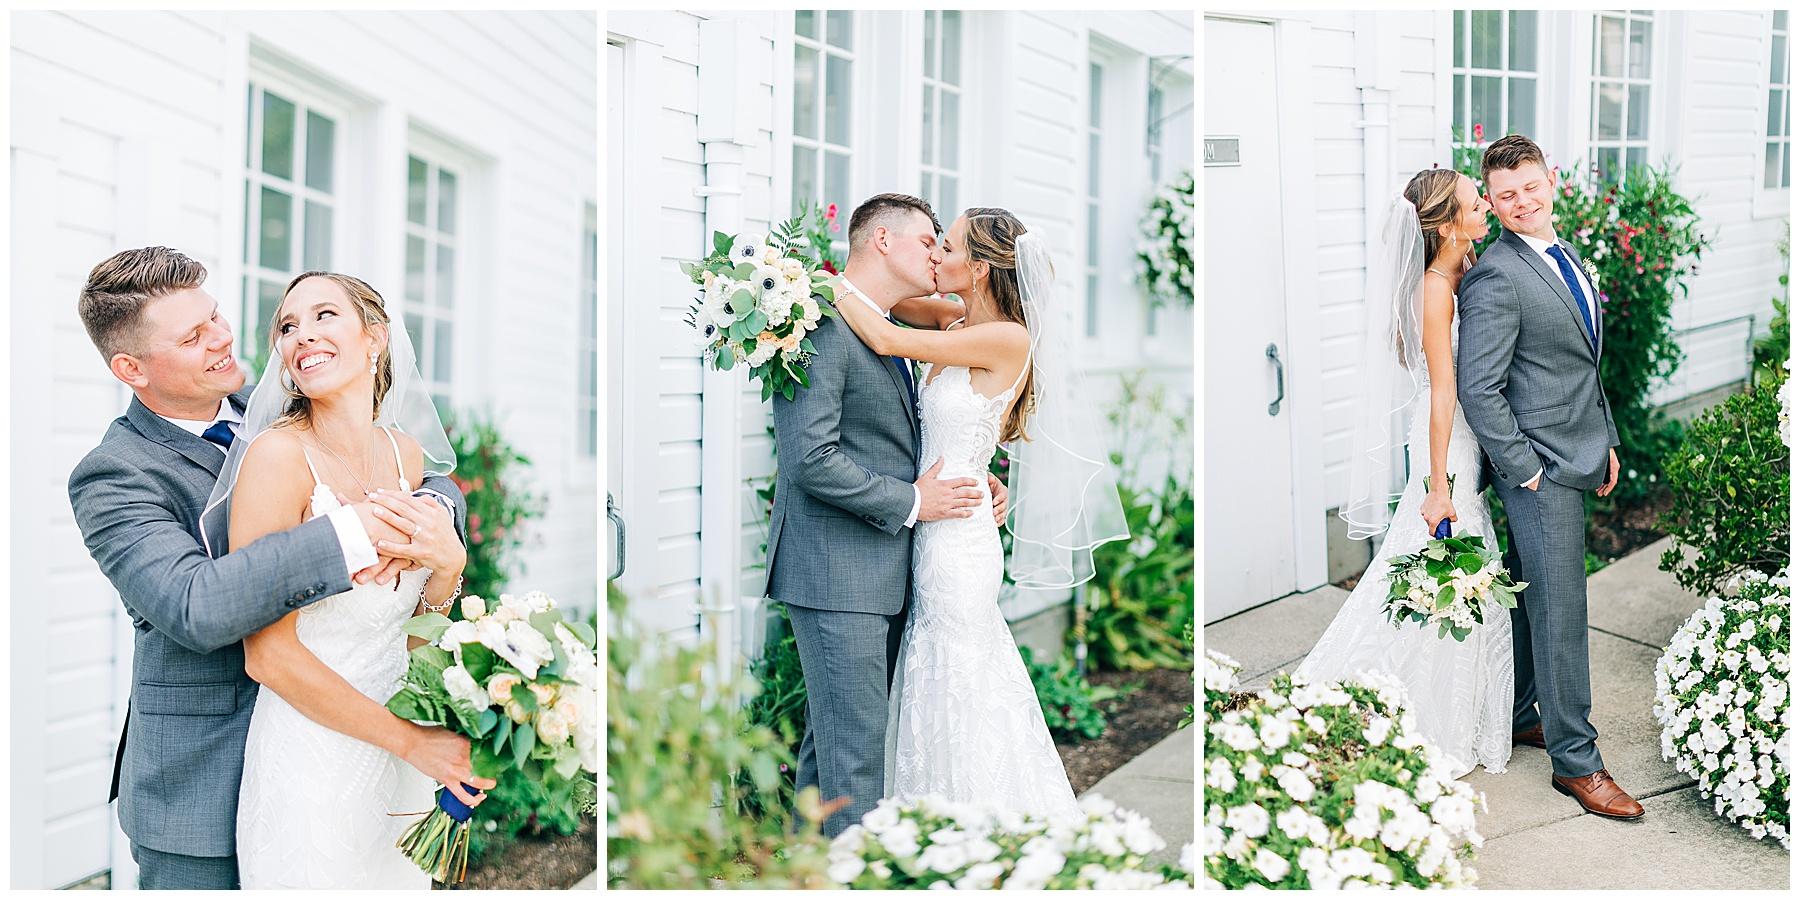 Tylyn & Tate Fine Art Wedding Photographer Oswego Hills Winery Lake Oswego Oregon, Fine Art Wedding Photographer Portland, Oregon